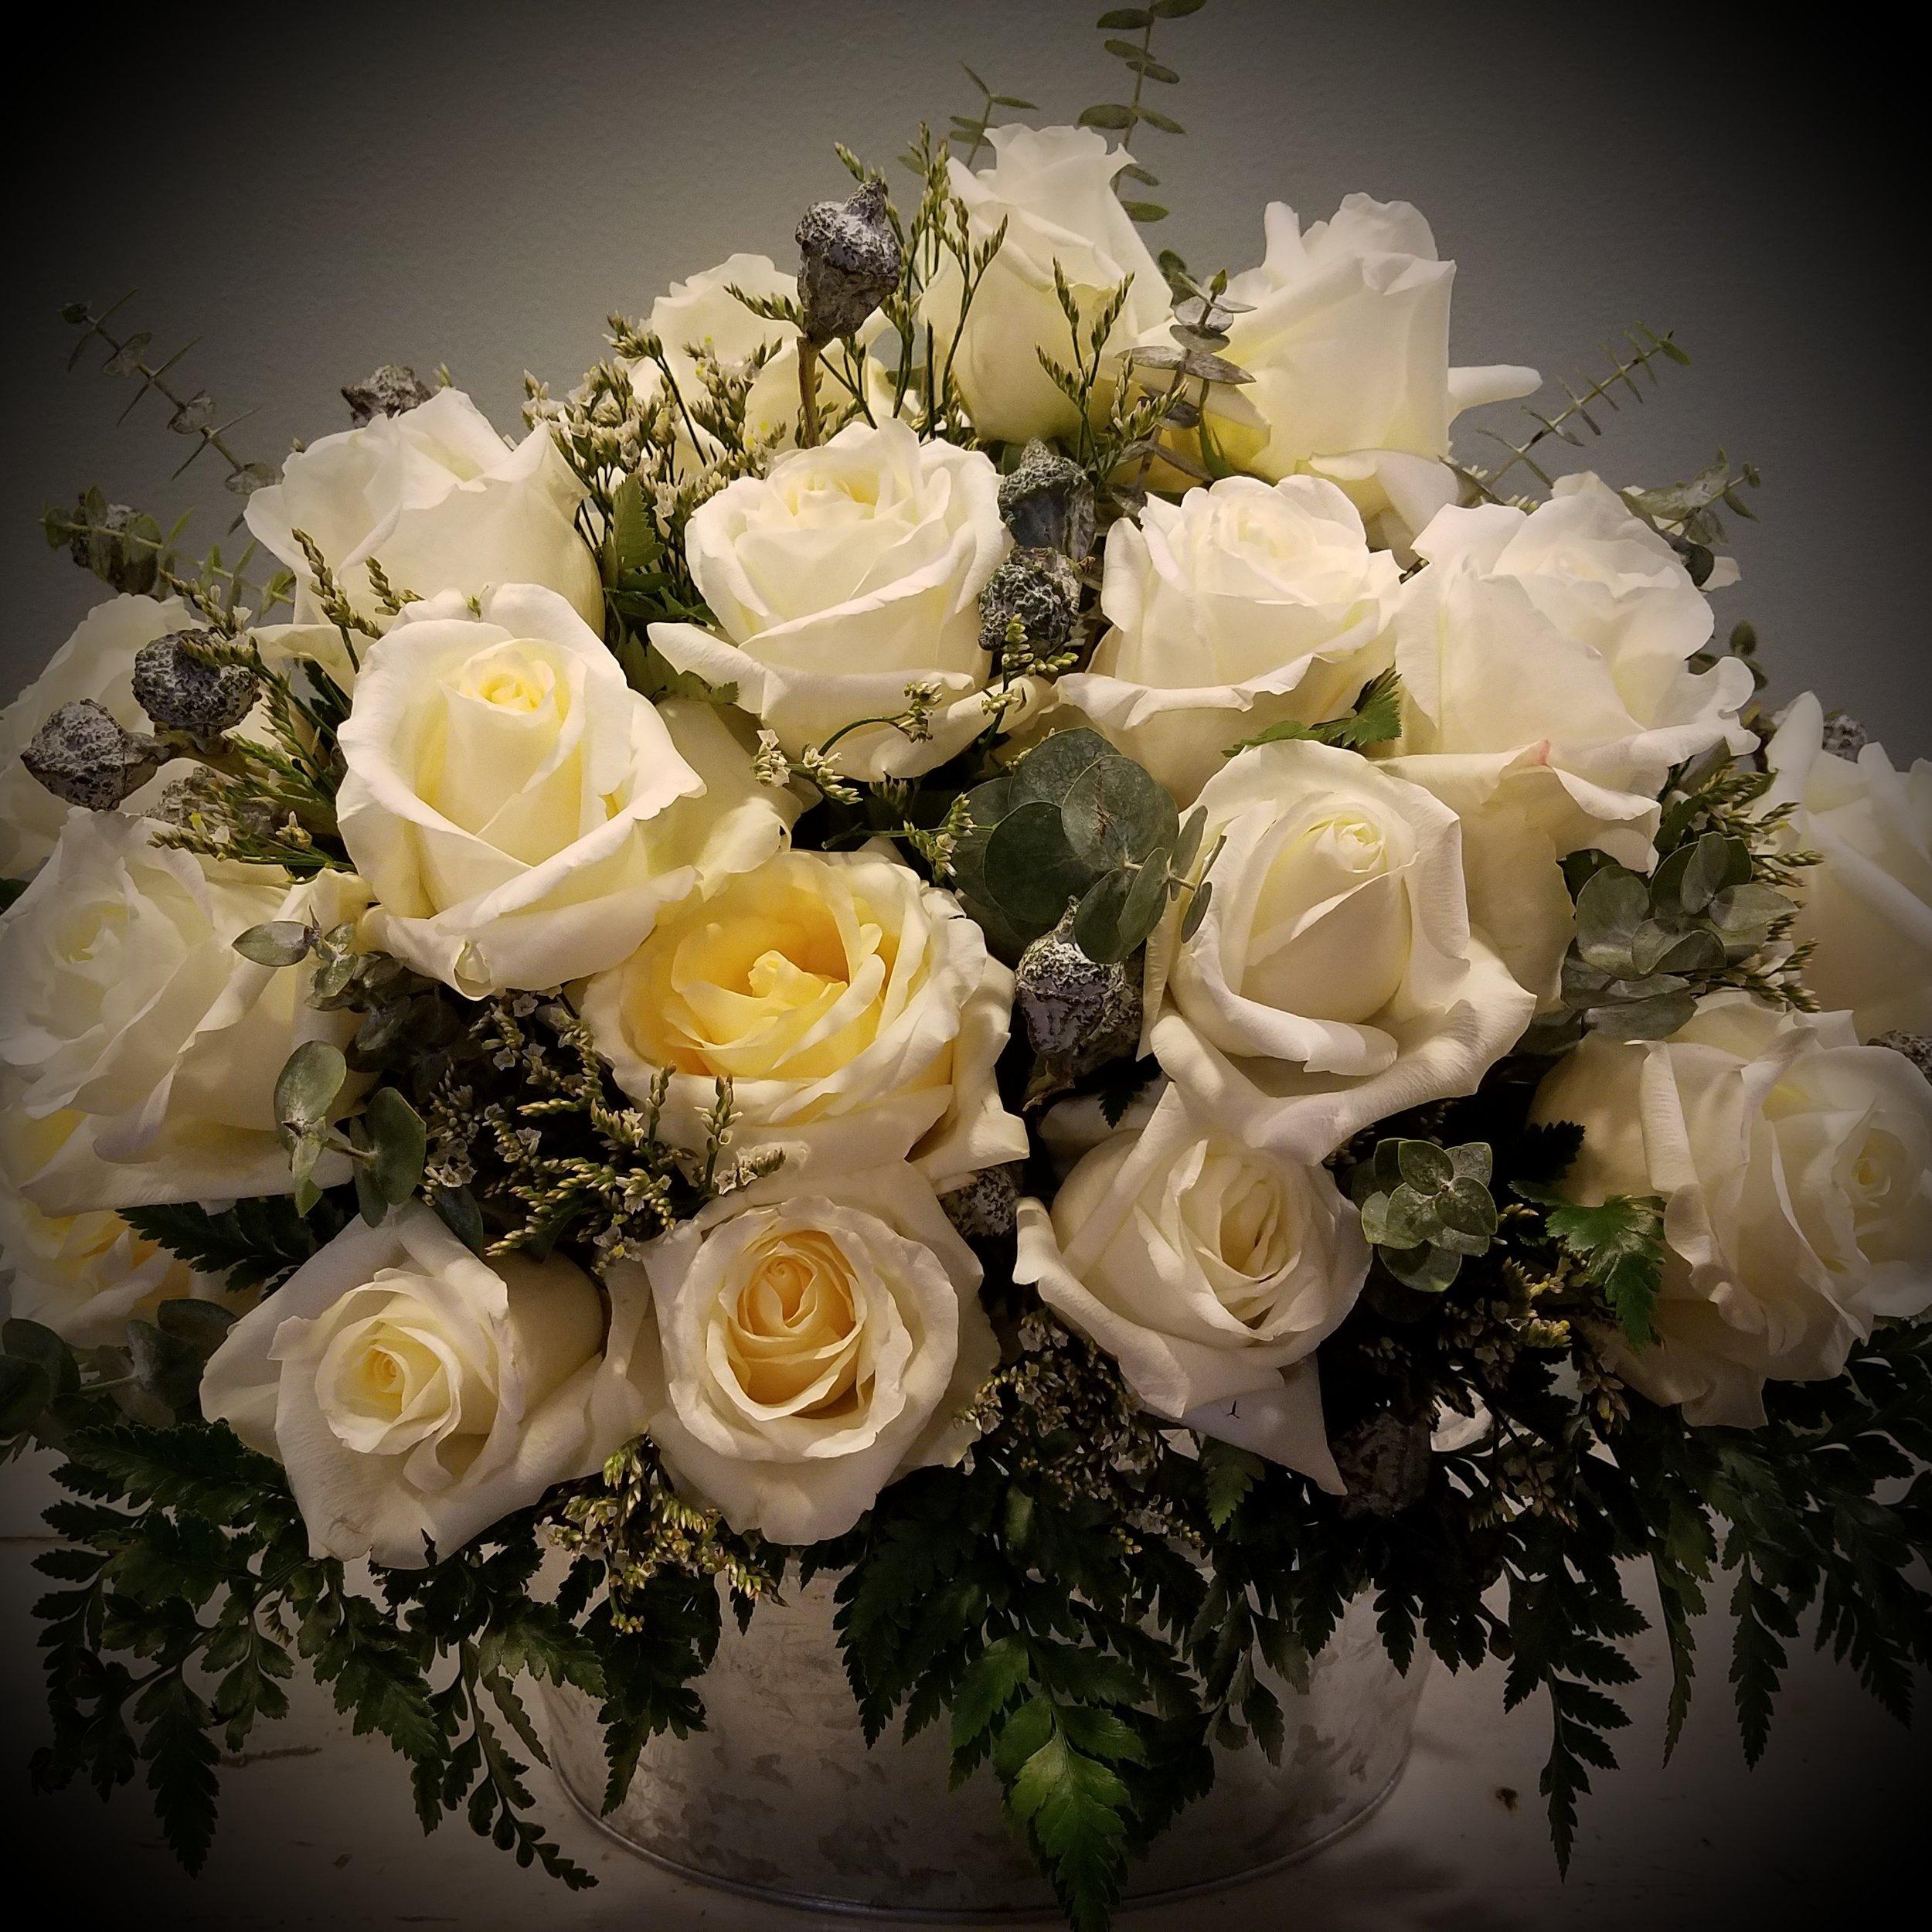 White roses sympathy arrangement